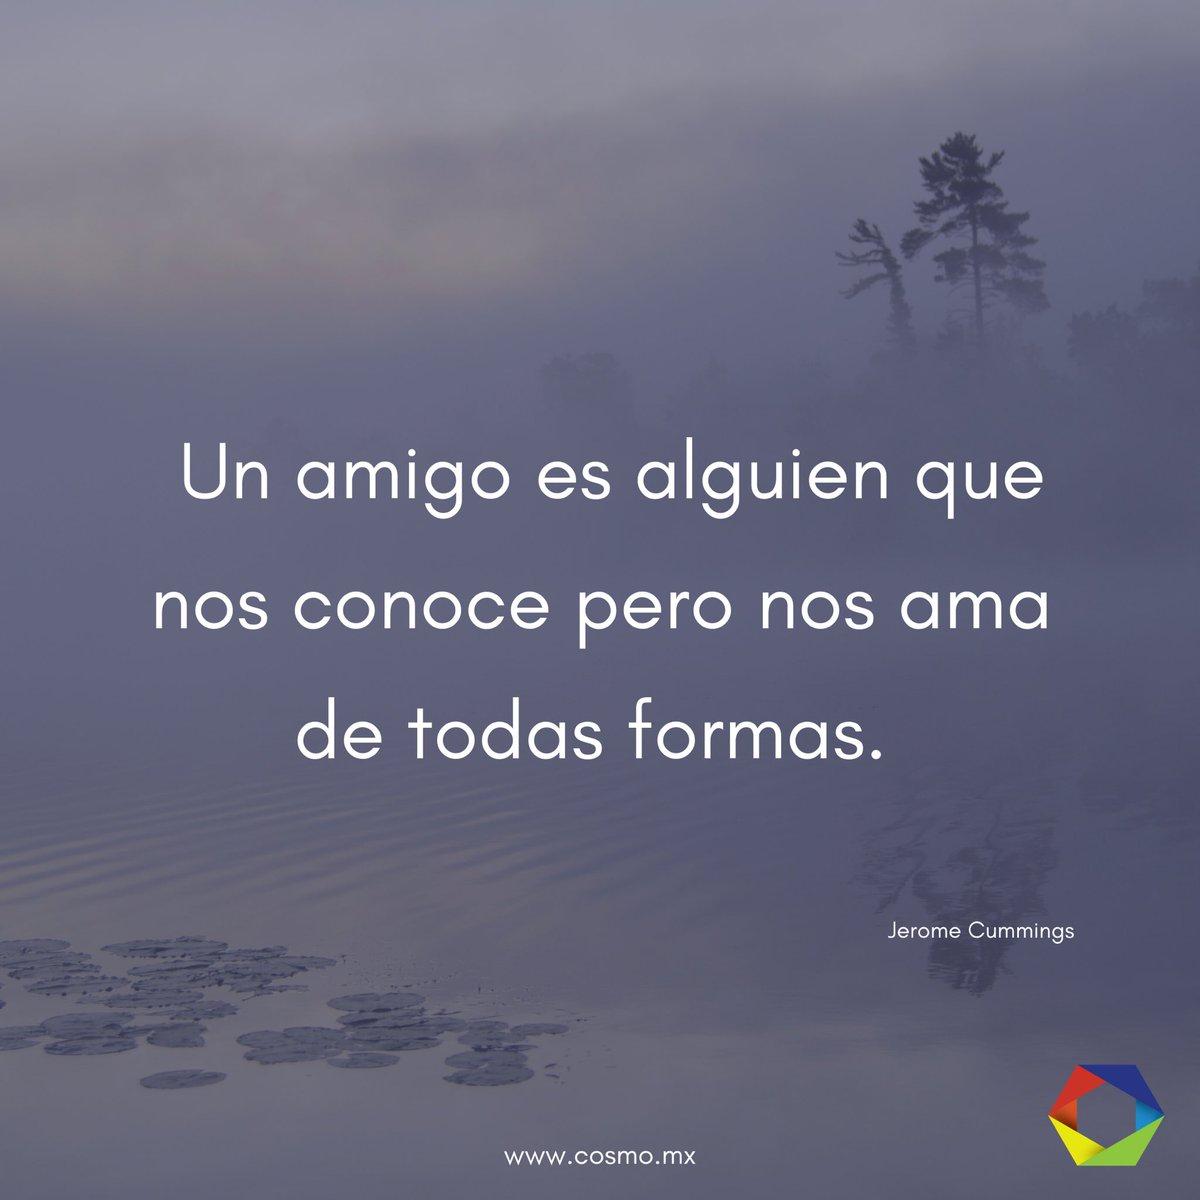 Amor incondicional #frasesdereflexion #frasescosmo #mesdelaamistadpic.twitter.com/bBX6pTWQ0T